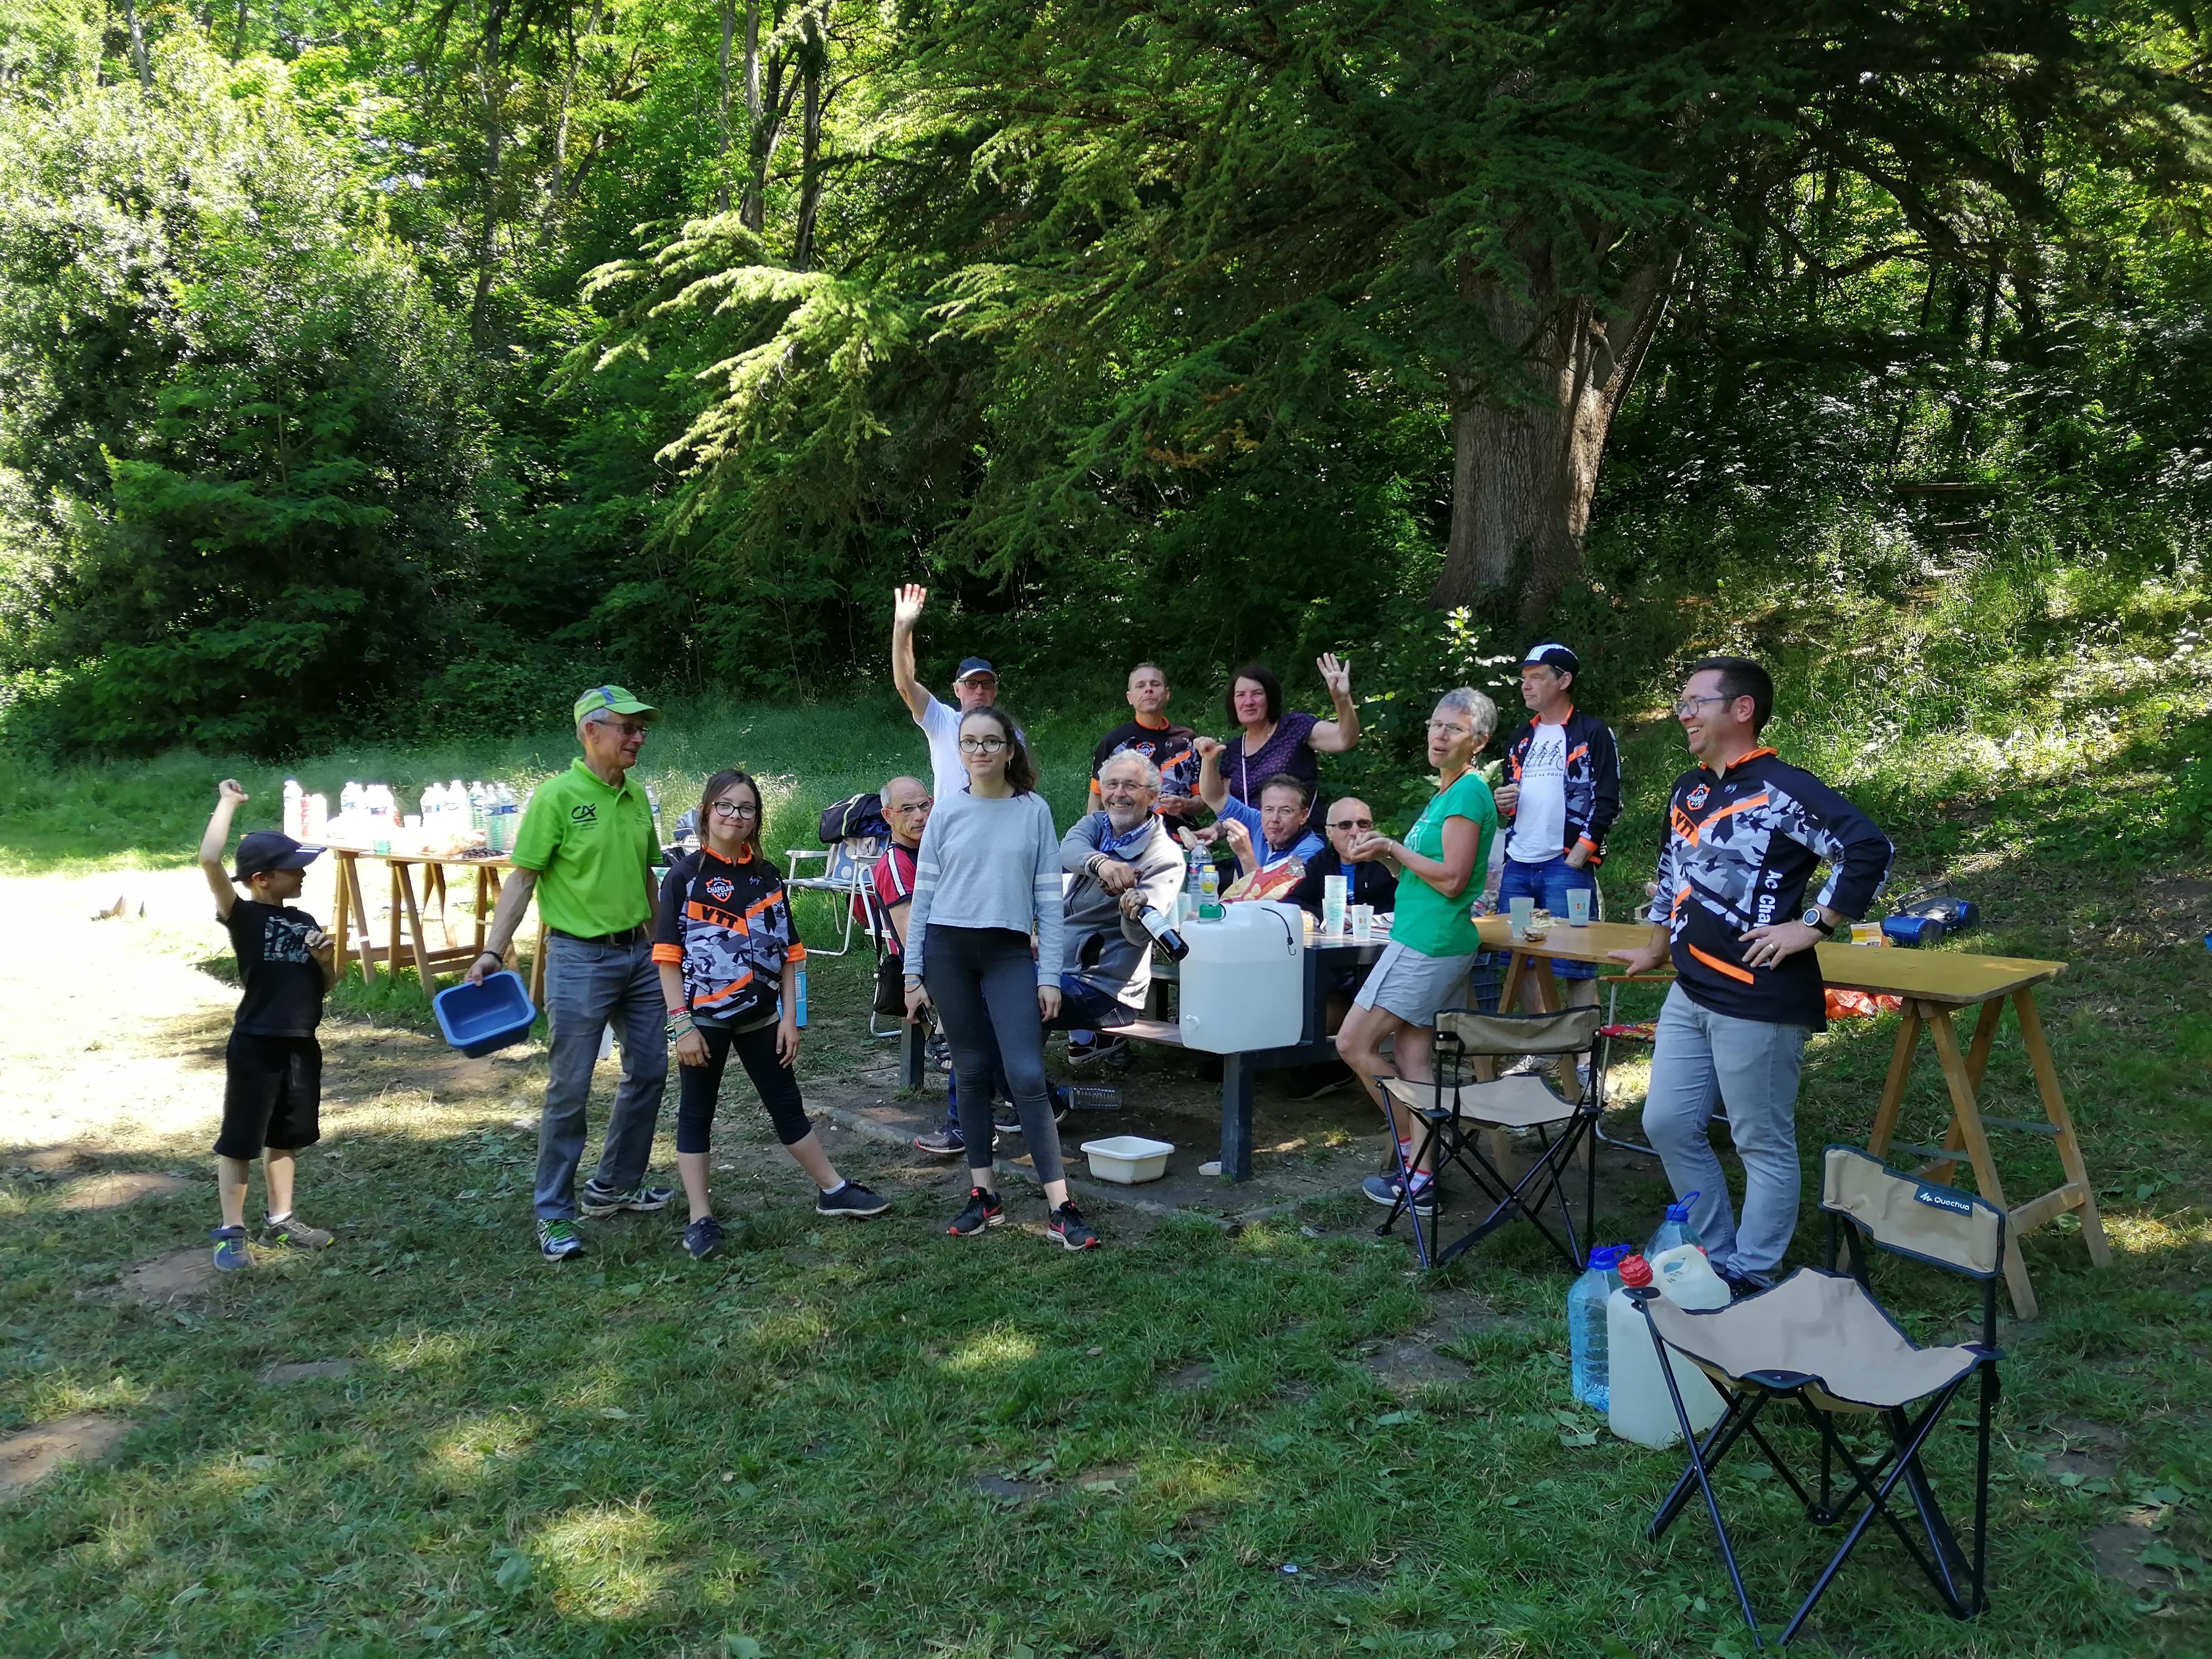 http://acc-cyclisme.fr/wp-content/uploads/hm_bbpui/15053/obuaaylbnar9zbqwjtgzhm5d3xunnbw2.jpg